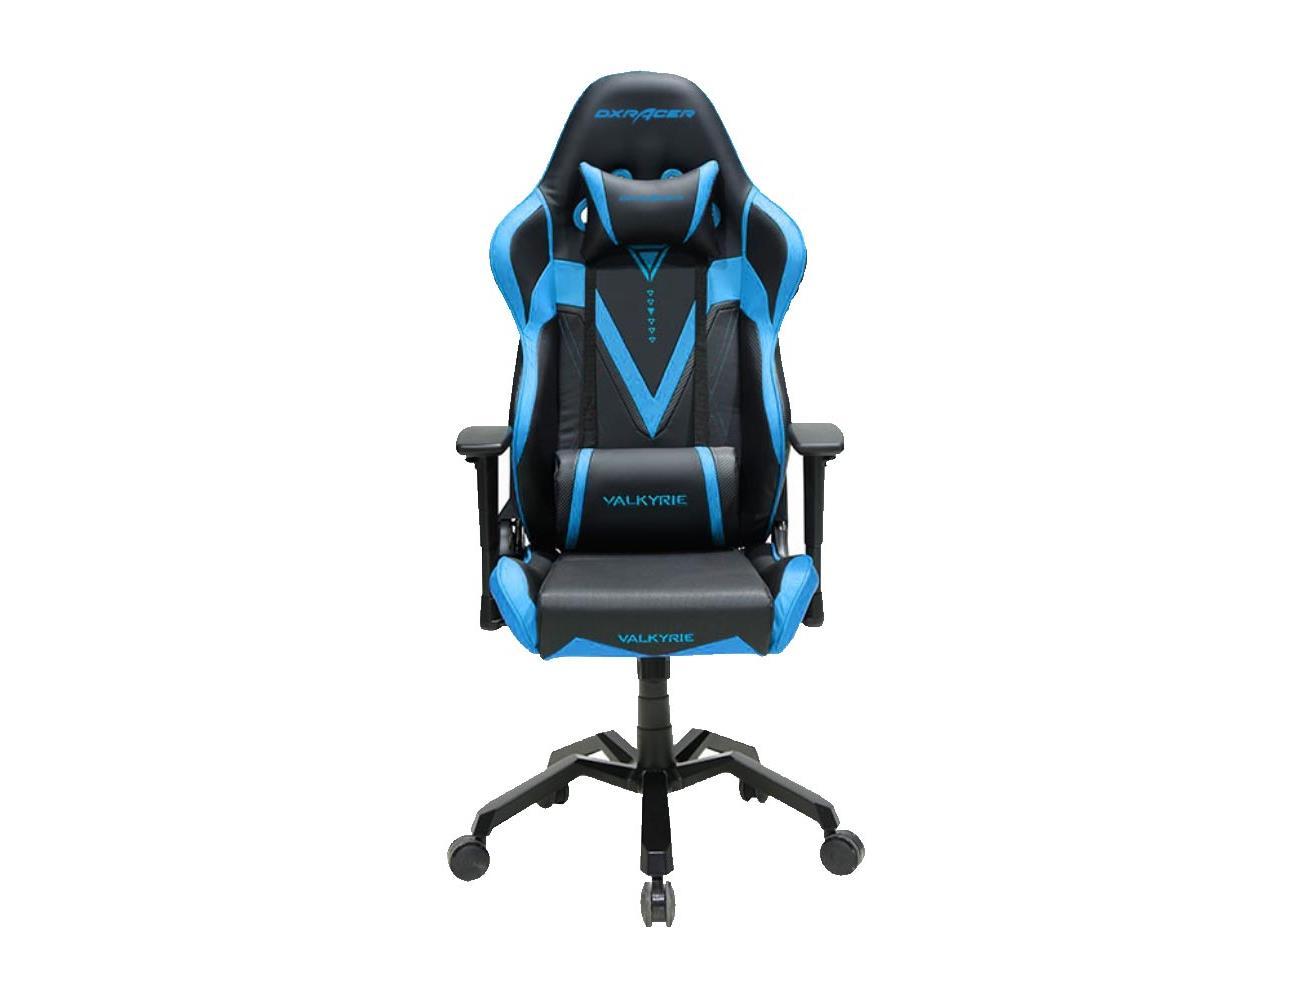 Dxracer Valkyrie Series Gaming Chair Black Blue Blink